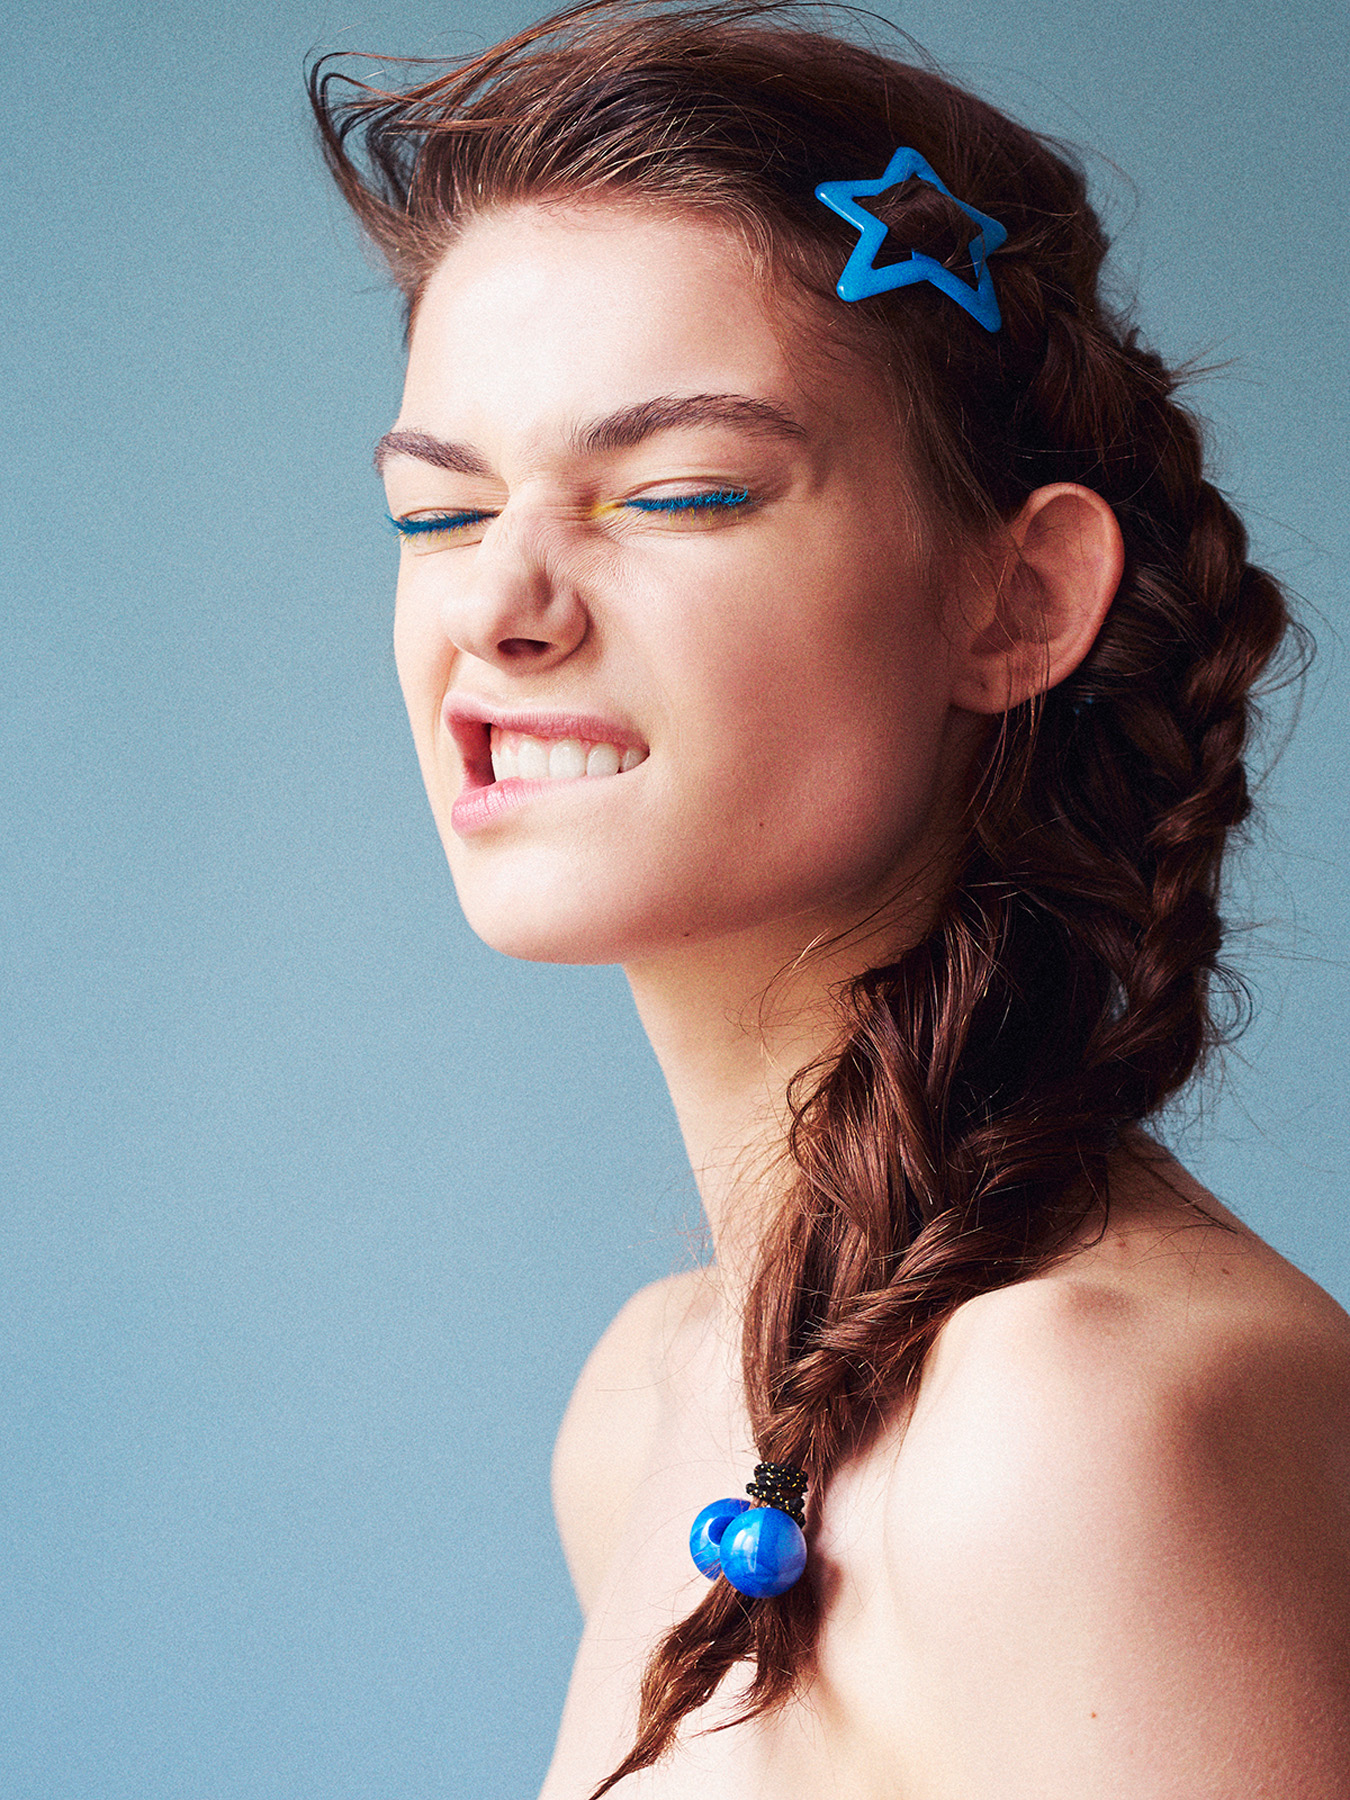 053-icon-artist-management-Kristin-Vicari-Beauty-Nylon.jpg